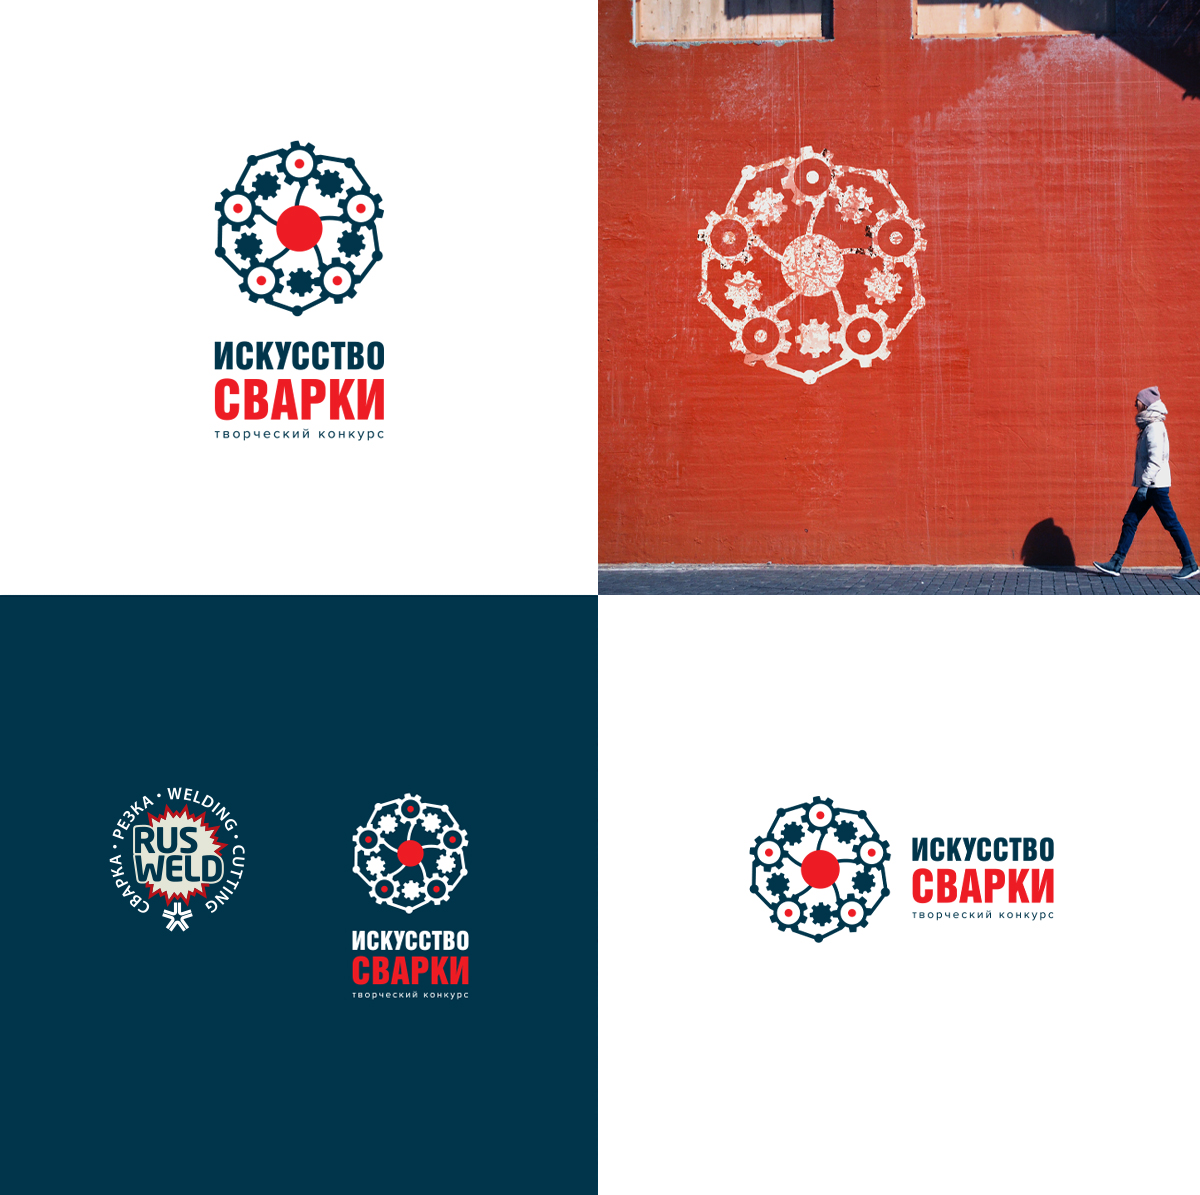 Разработка логотипа для Конкурса фото f_6485f704cf755521.jpg